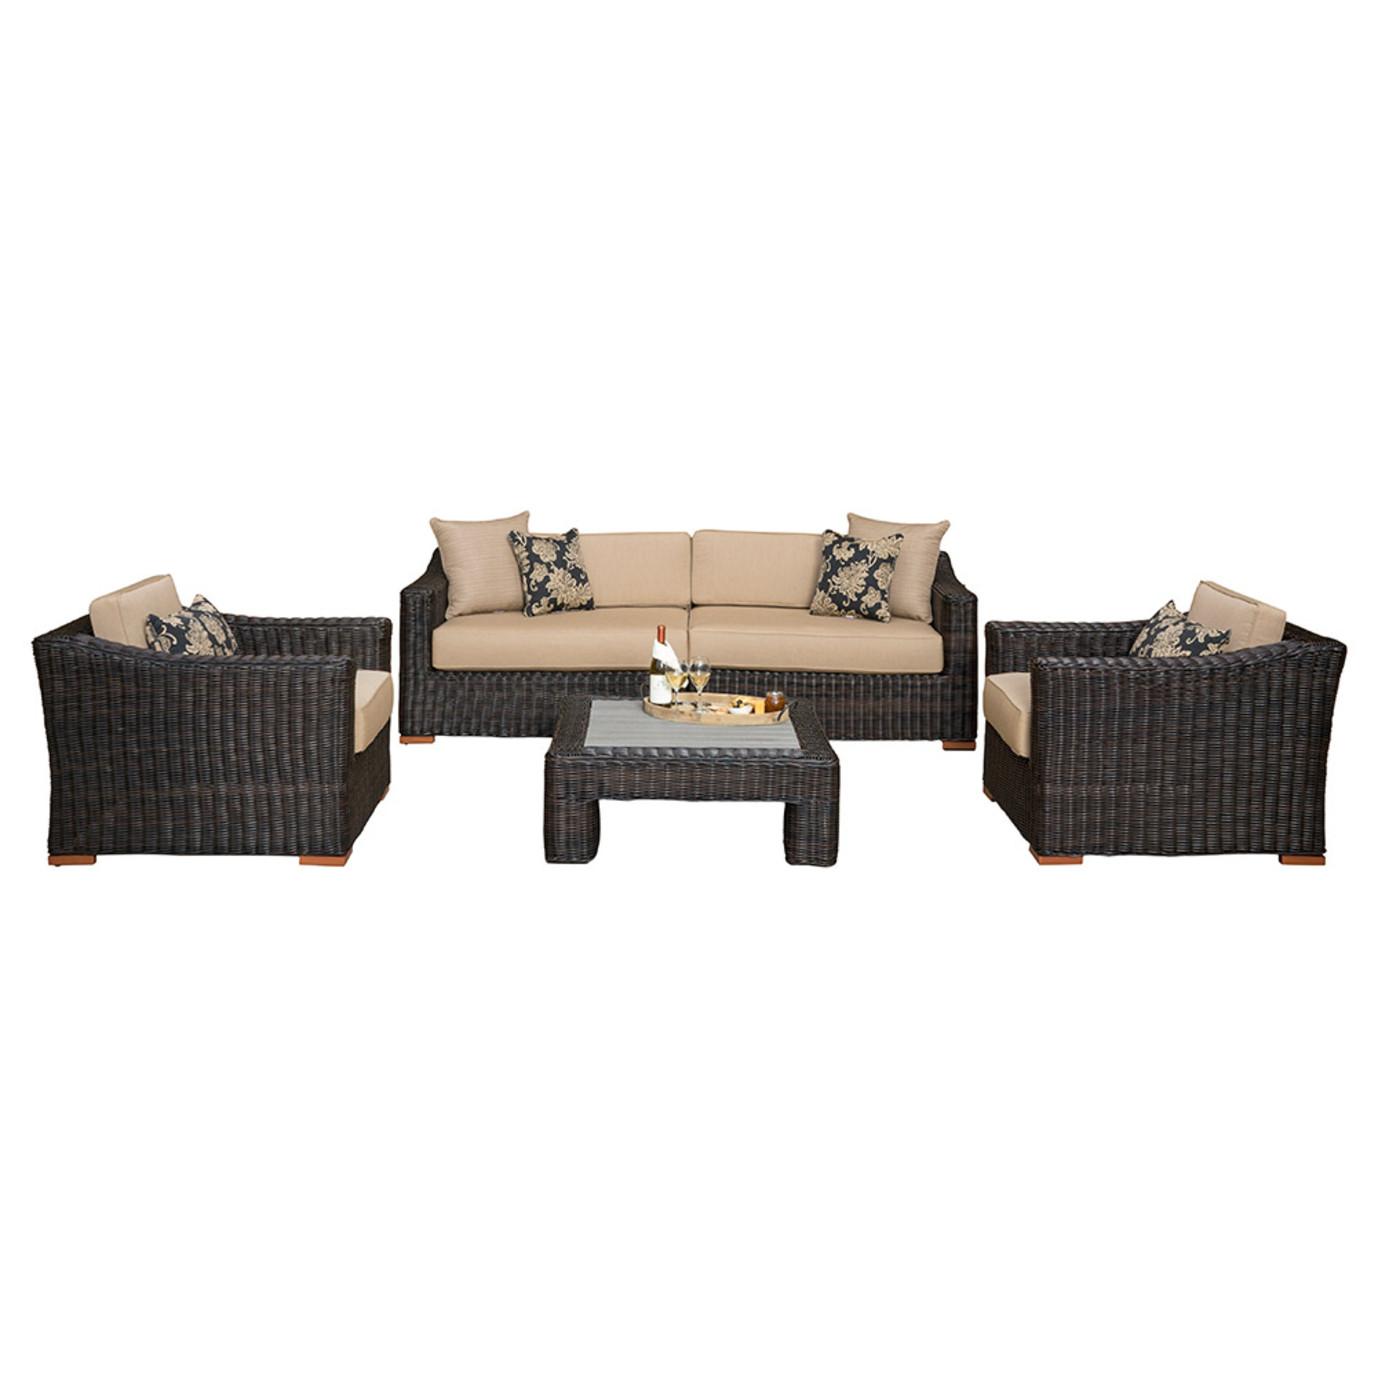 Resort™ 5pc Deep Seating Set - Espresso/Heather Beige